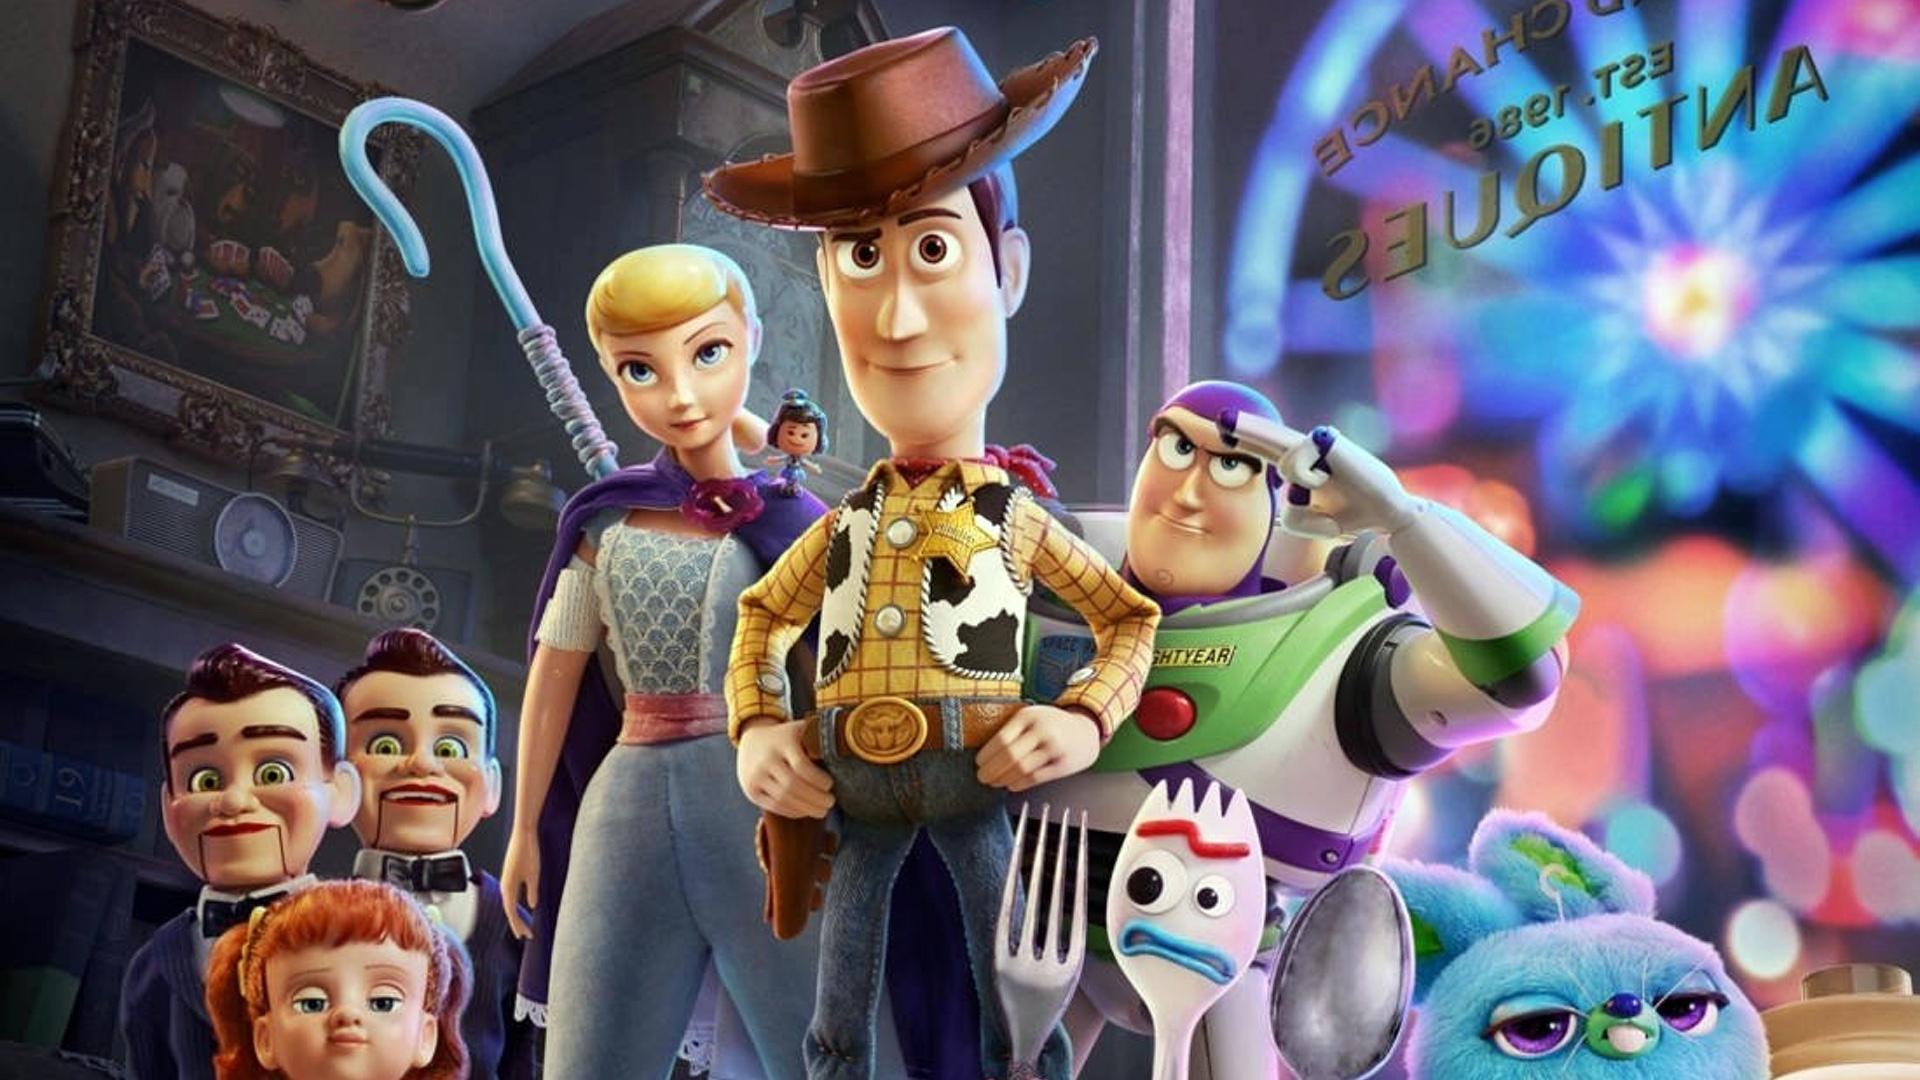 Toy Story 4, una nuova avventura per Woody & Co.